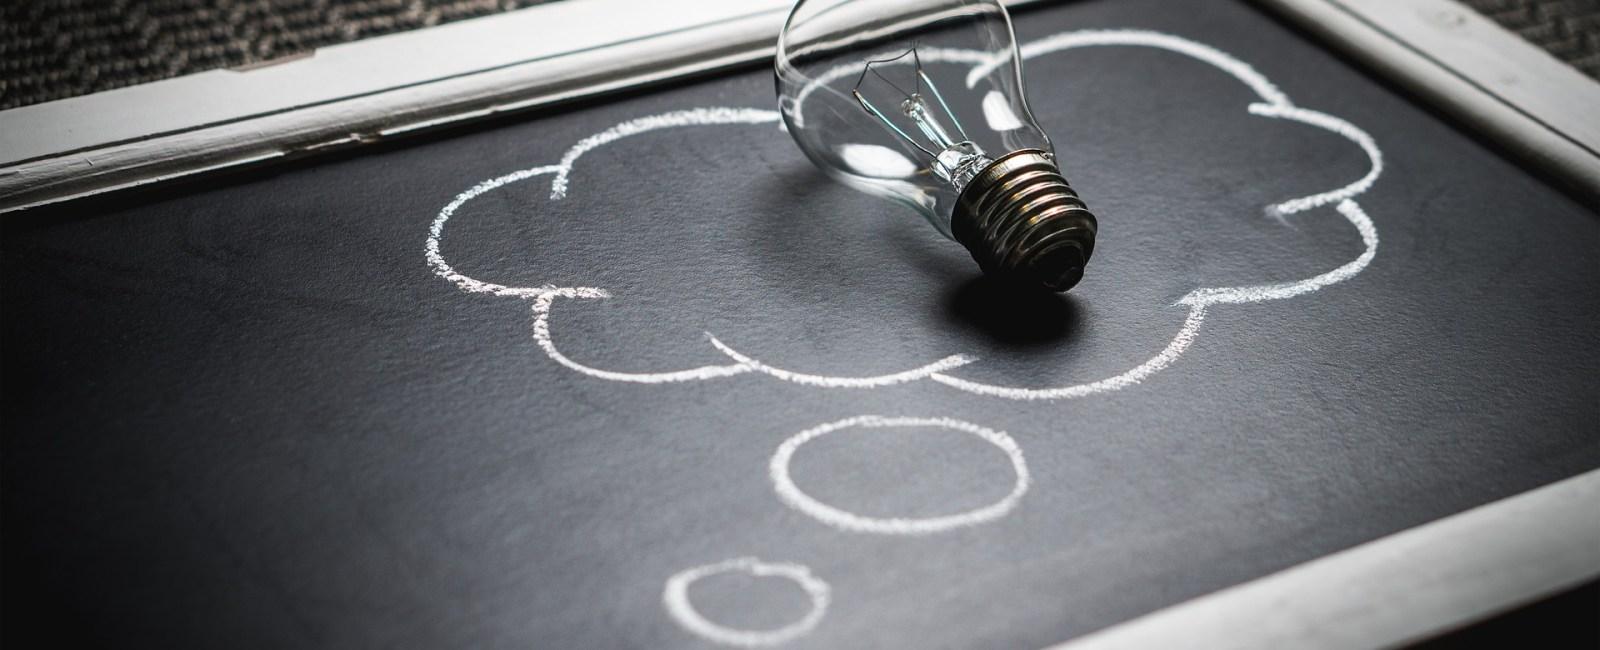 learning class training lightbulb (Photo credit: TeroVesalainen / Pixabay)